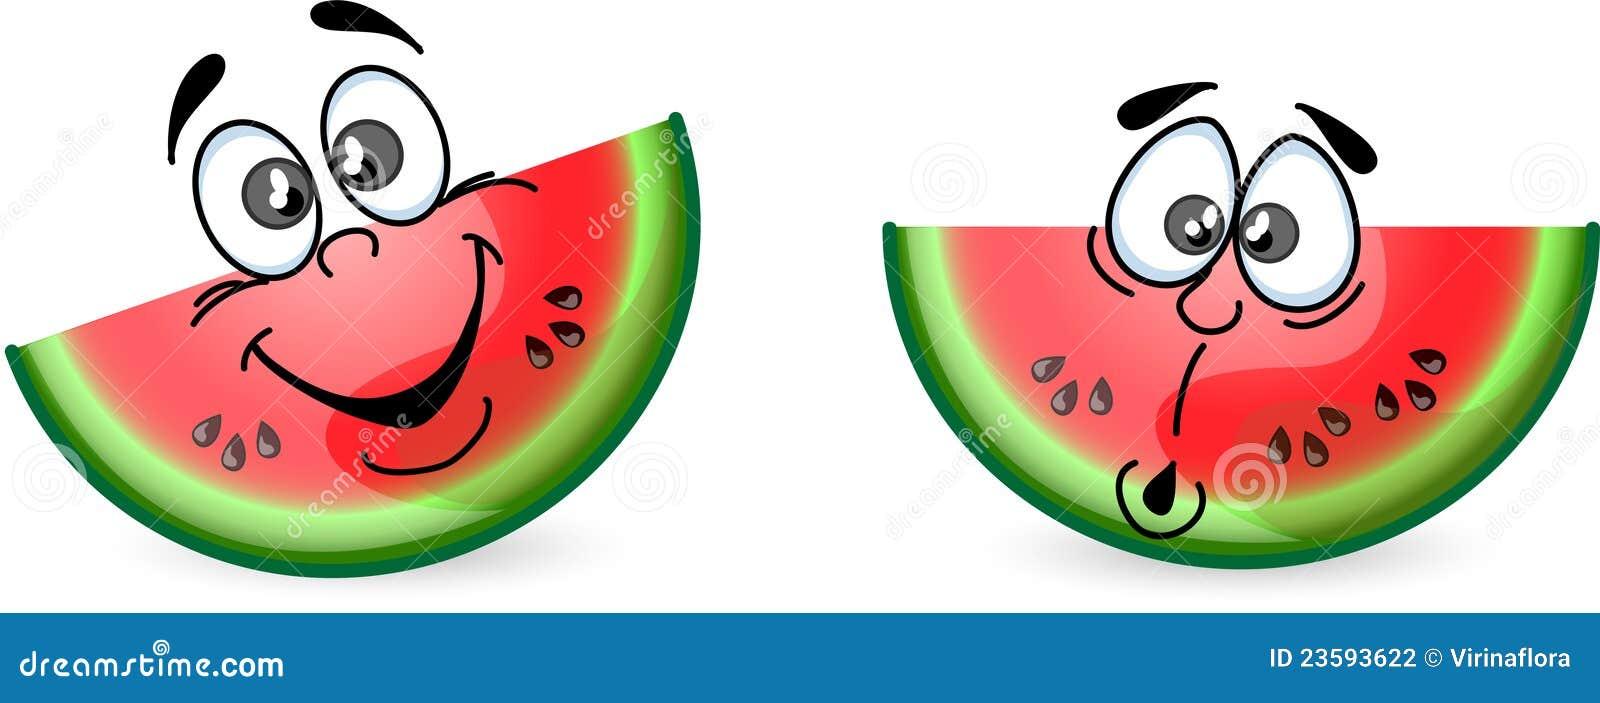 Cartoon Watermelonvector Stock Photography Image 23593622